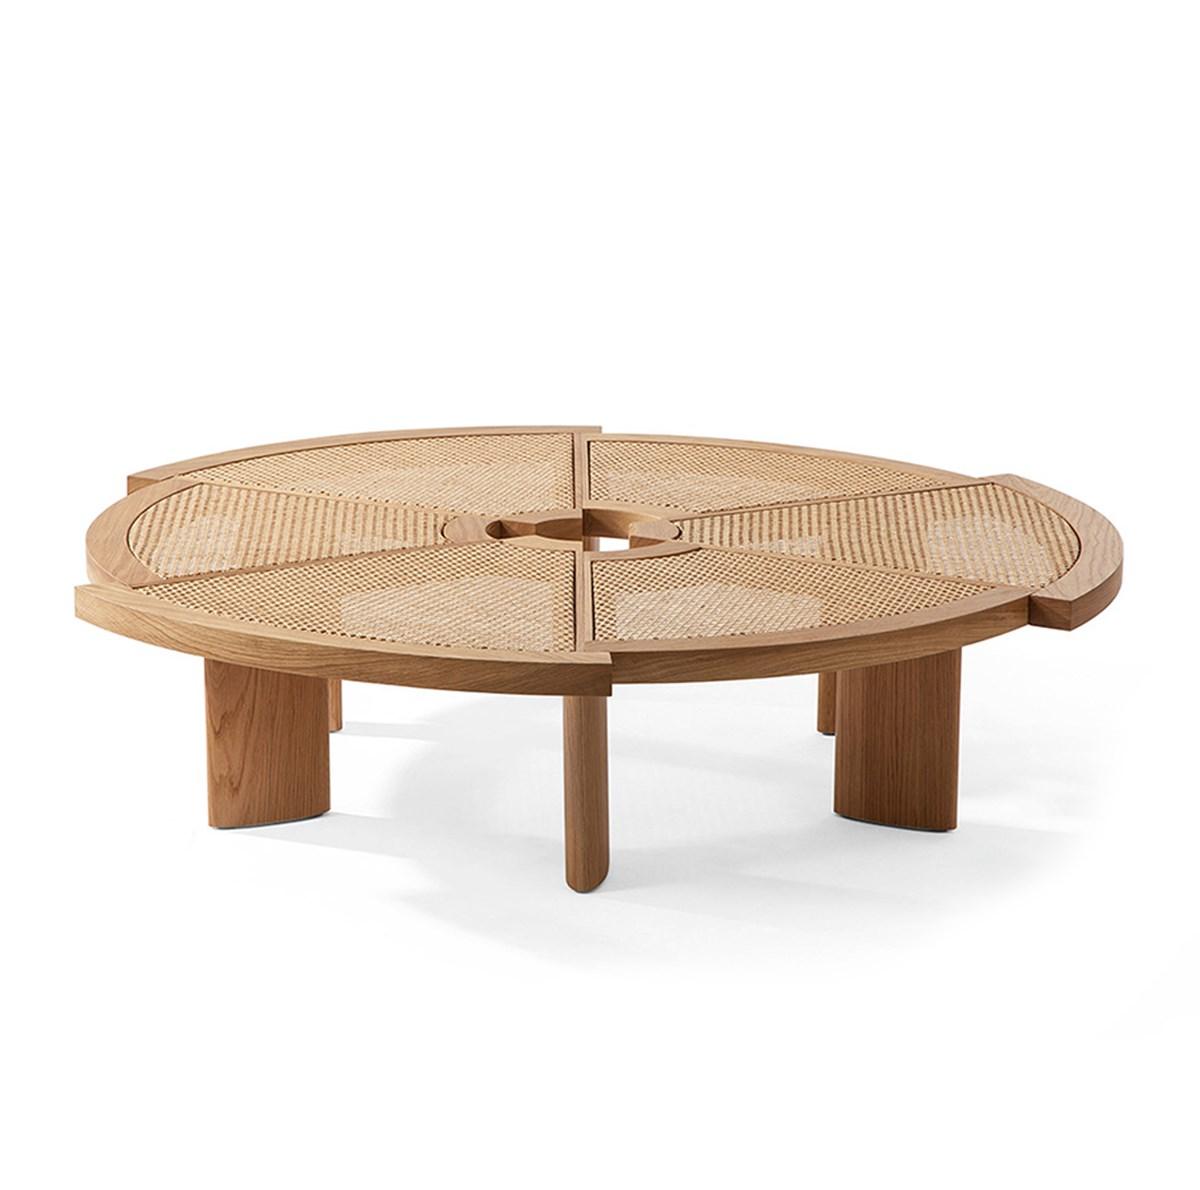 Cassina-Charlotte-Perriand-Rio-Table-Matisse-1